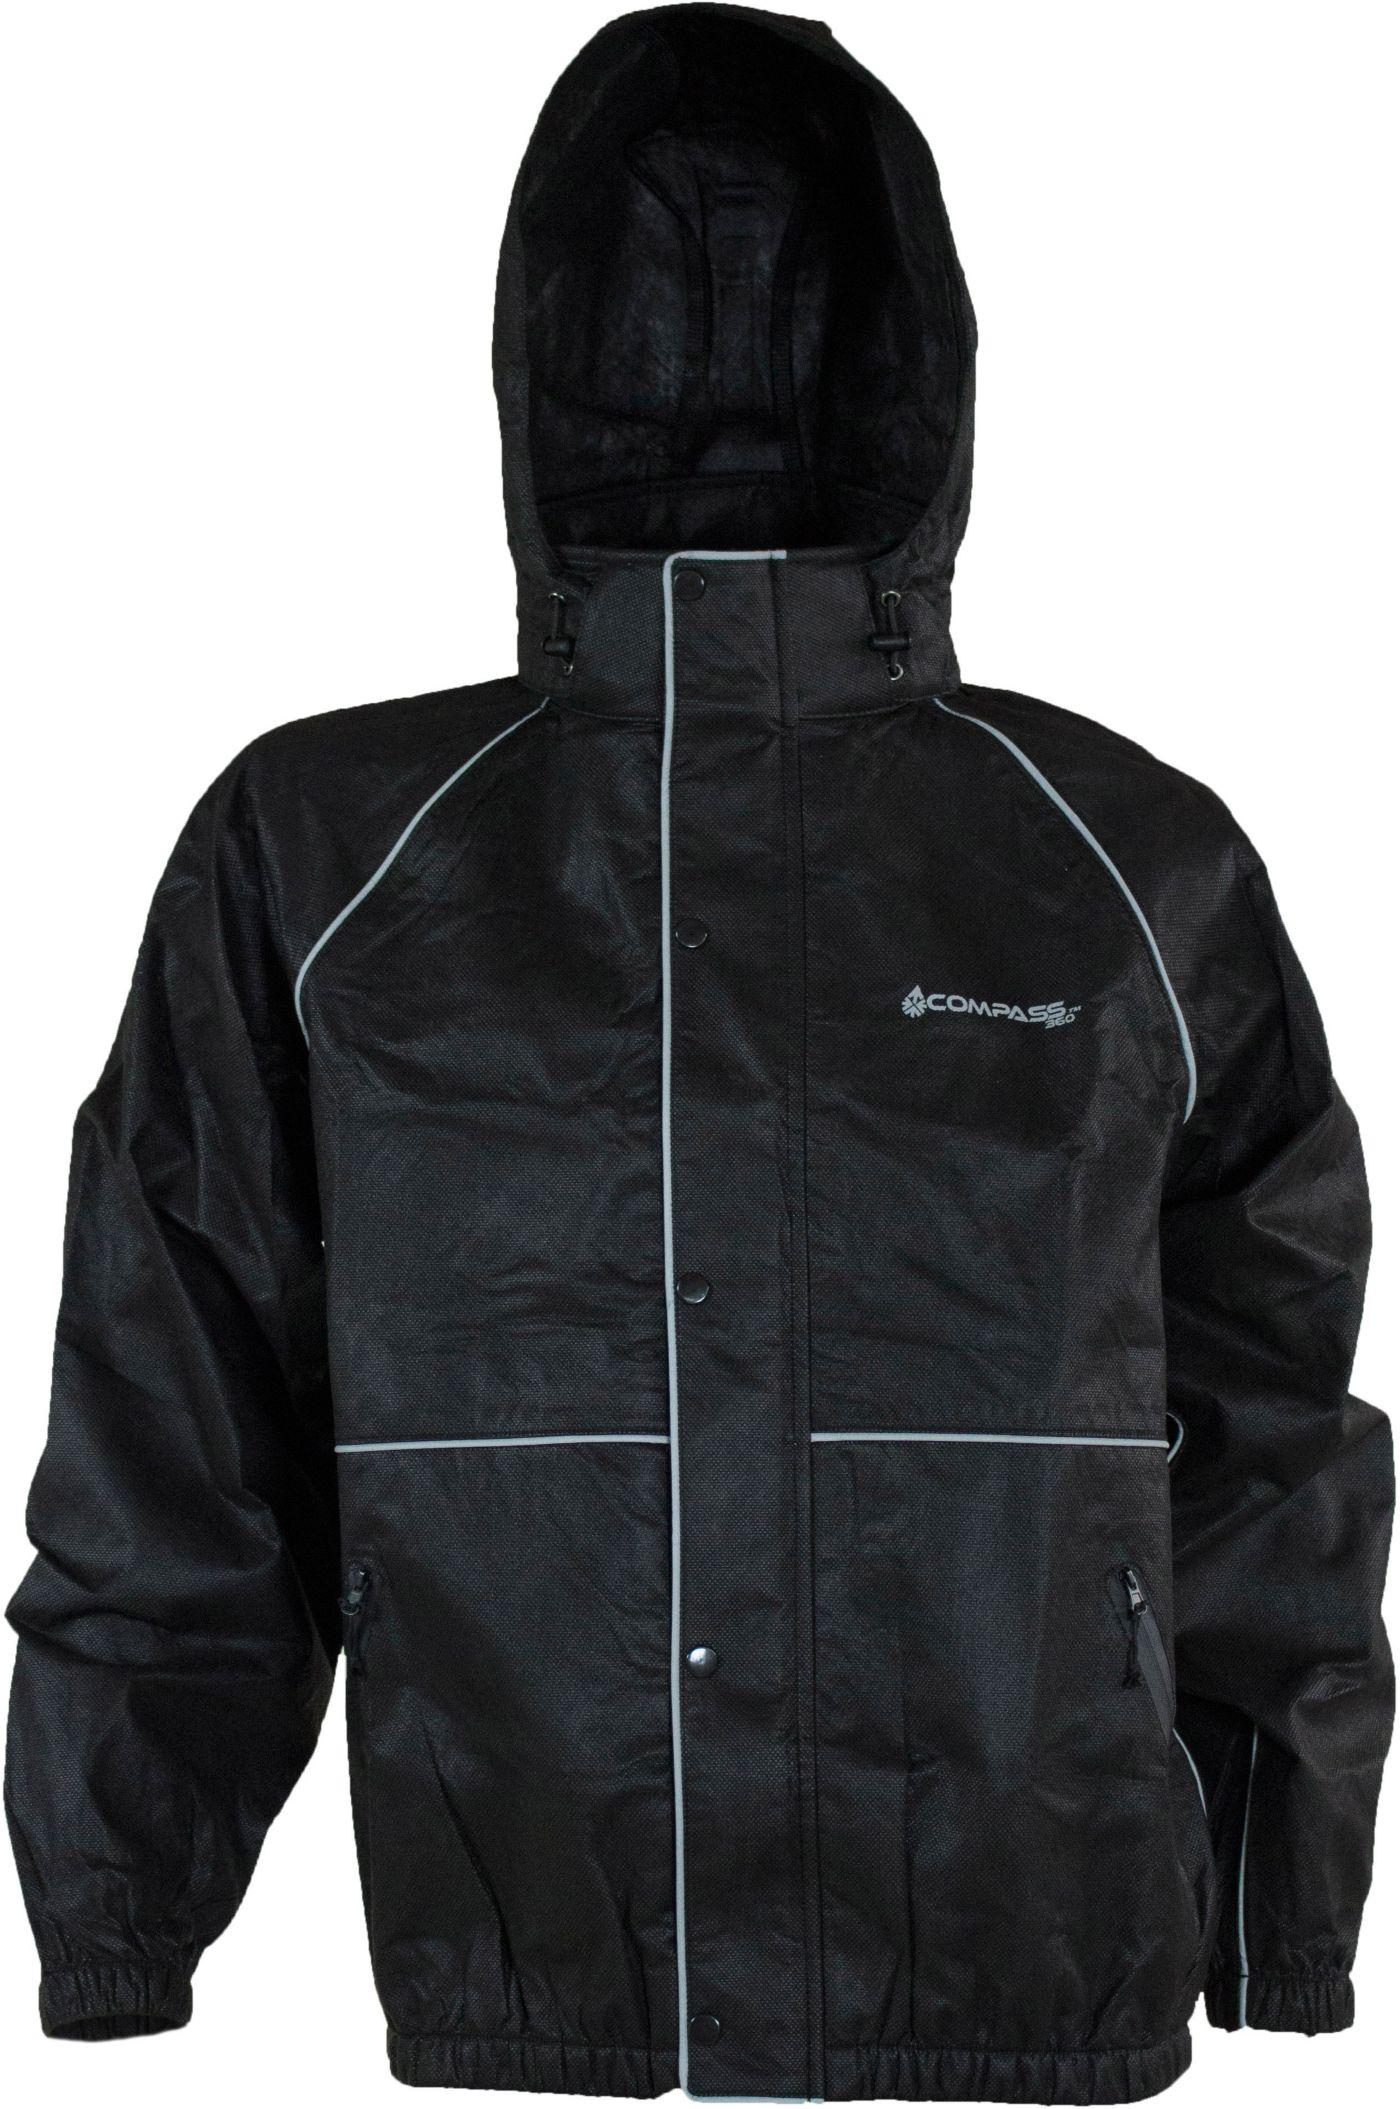 Compass 360 ROADTEK Reflective Waterproof Breathable Rain Jacket